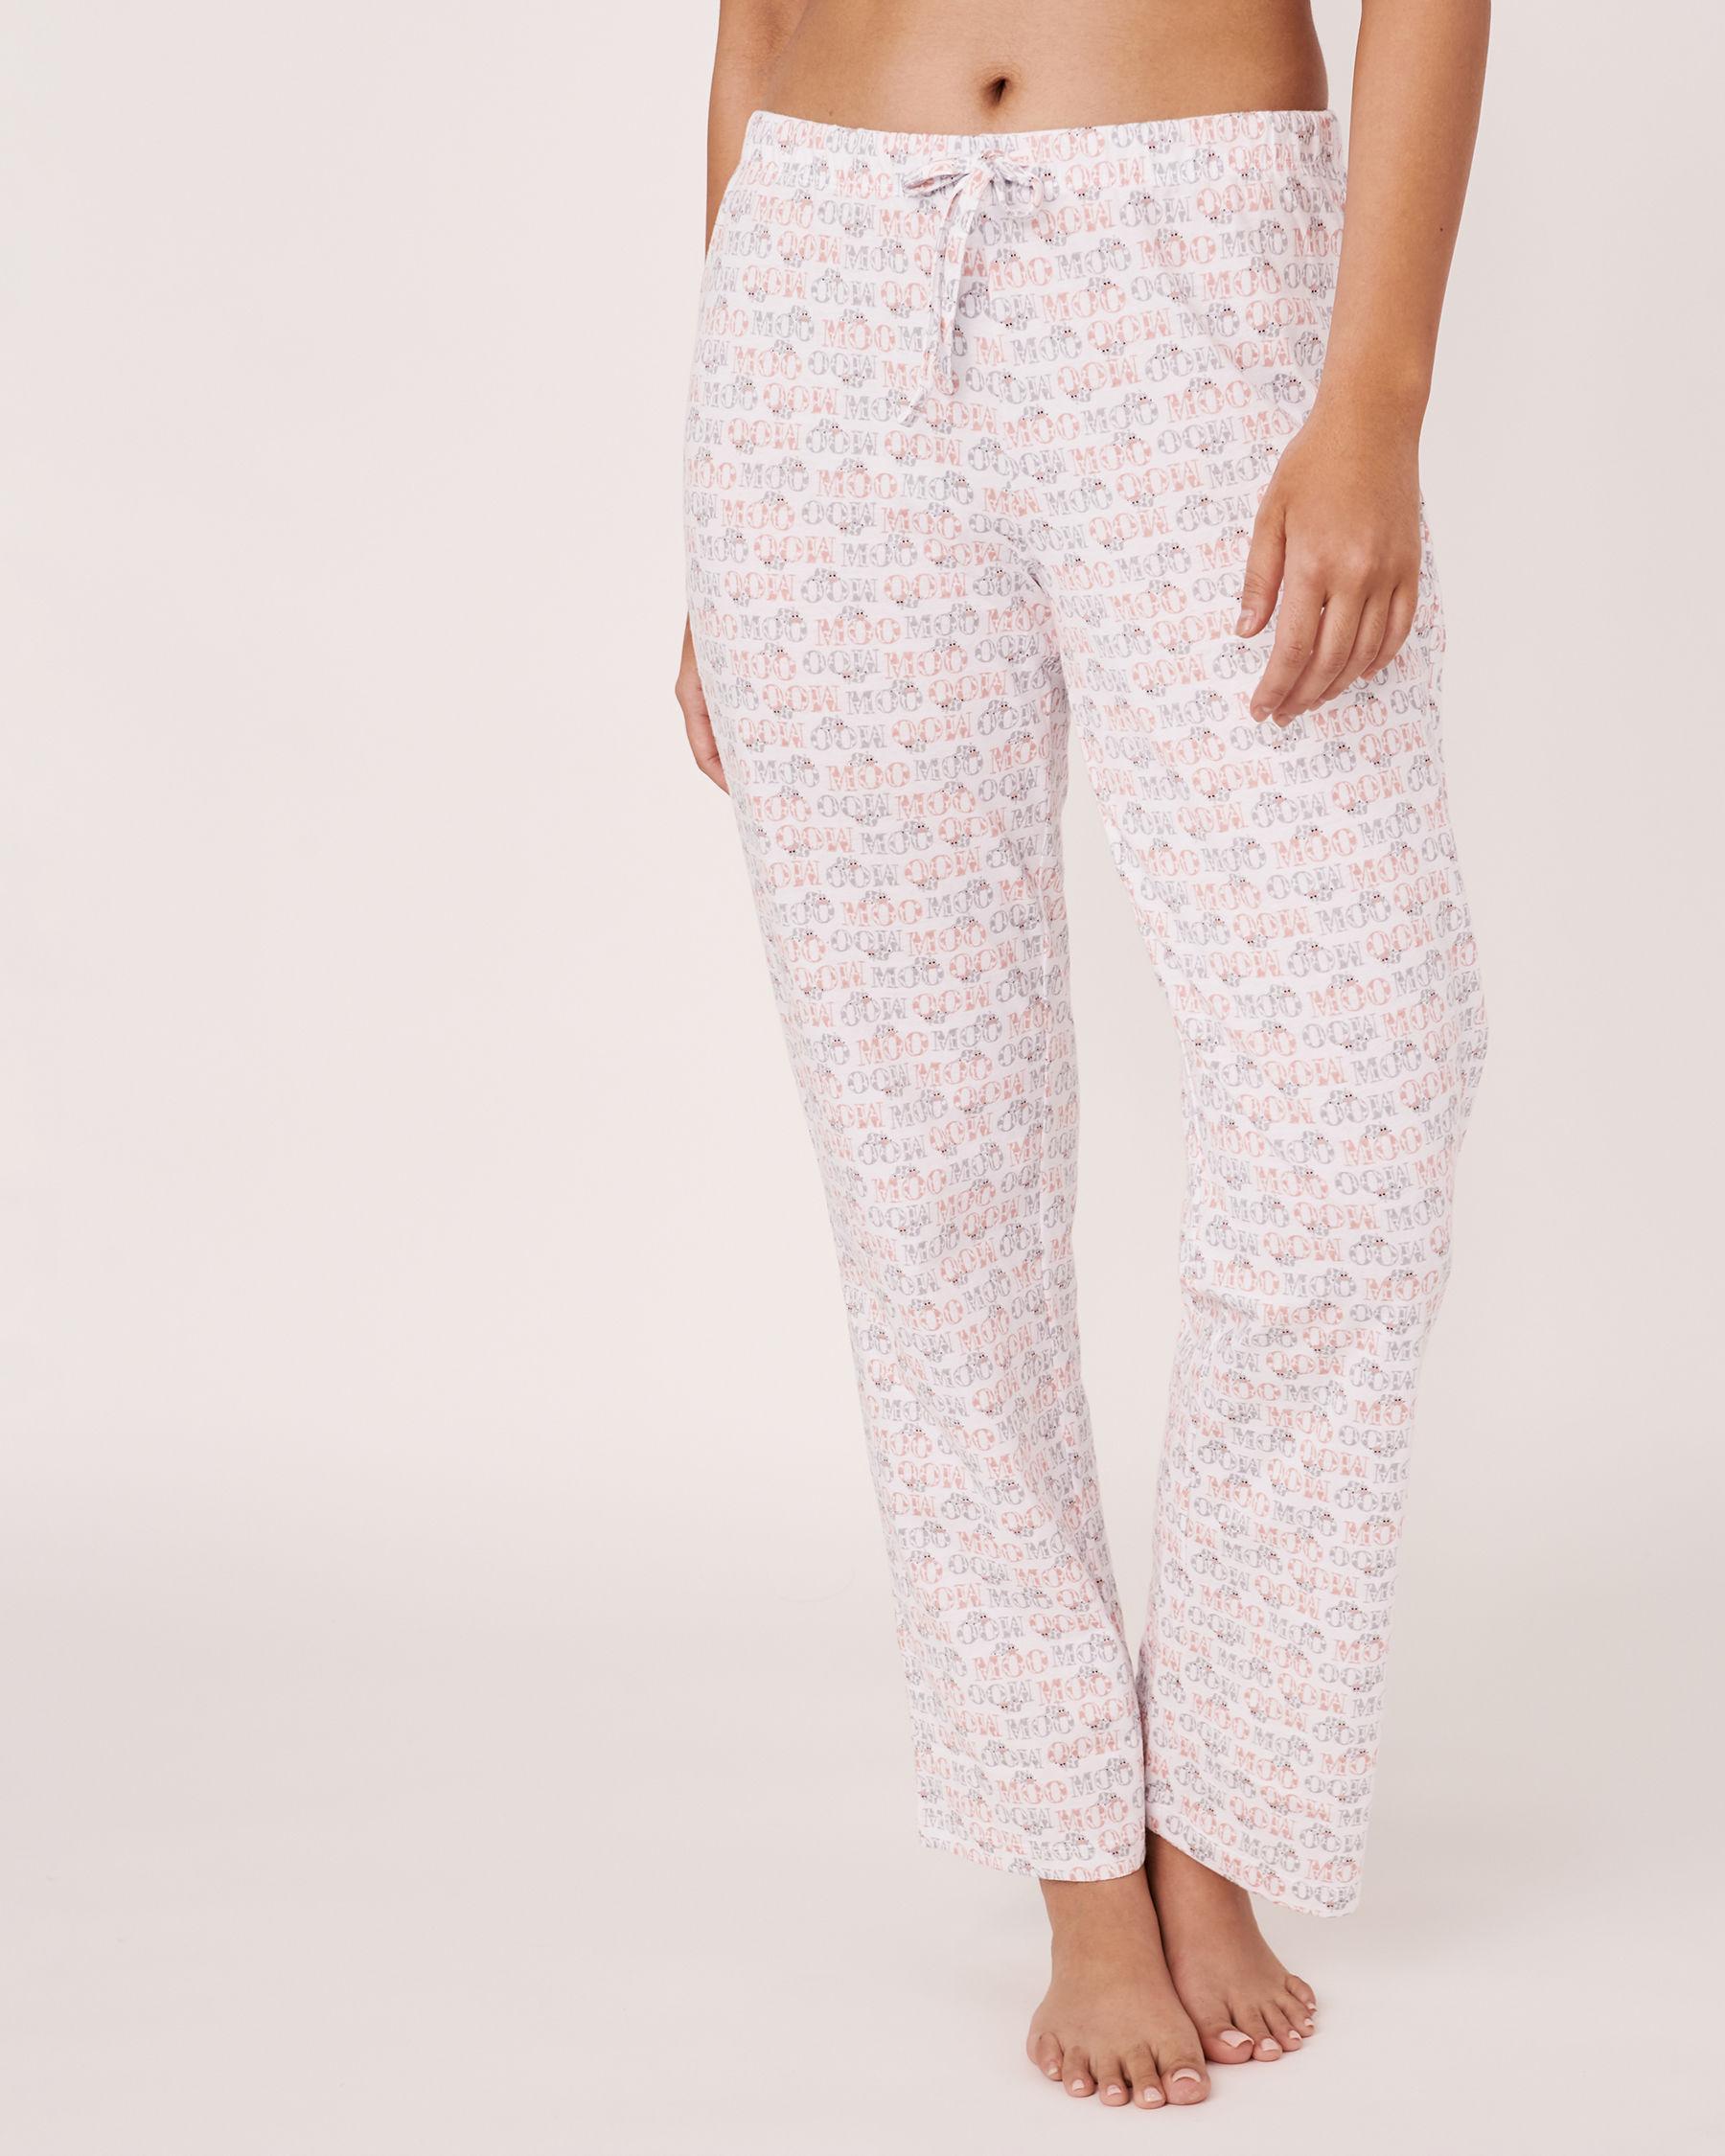 LA VIE EN ROSE Straight Leg Pyjama Pant MOO text 40200122 - View1